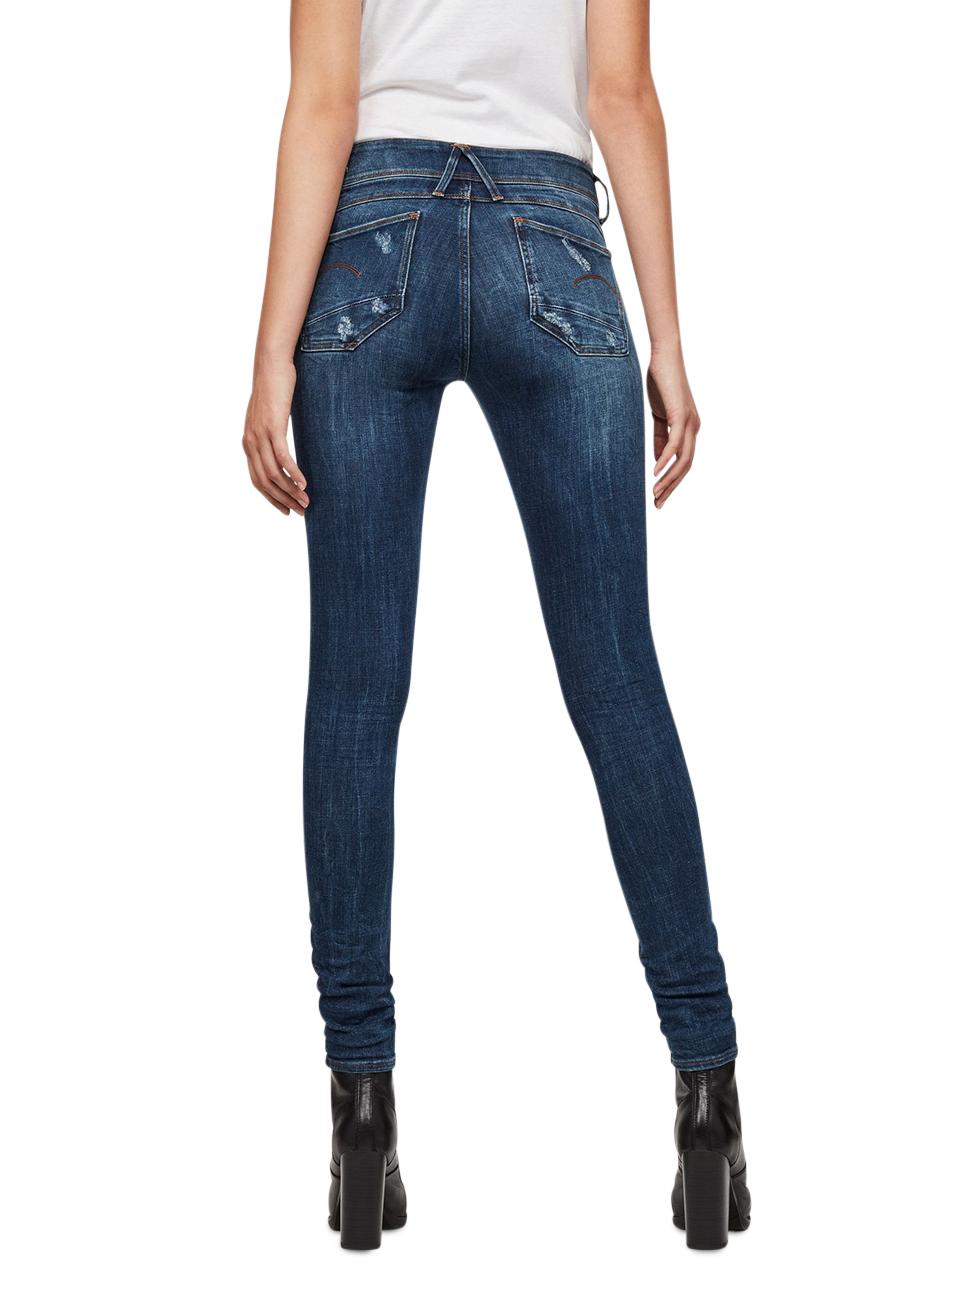 g-star-damen-jeans-lynn-mid-waist-super-skinny-blau-dark-aged-restored, 99.95 EUR @ jeans